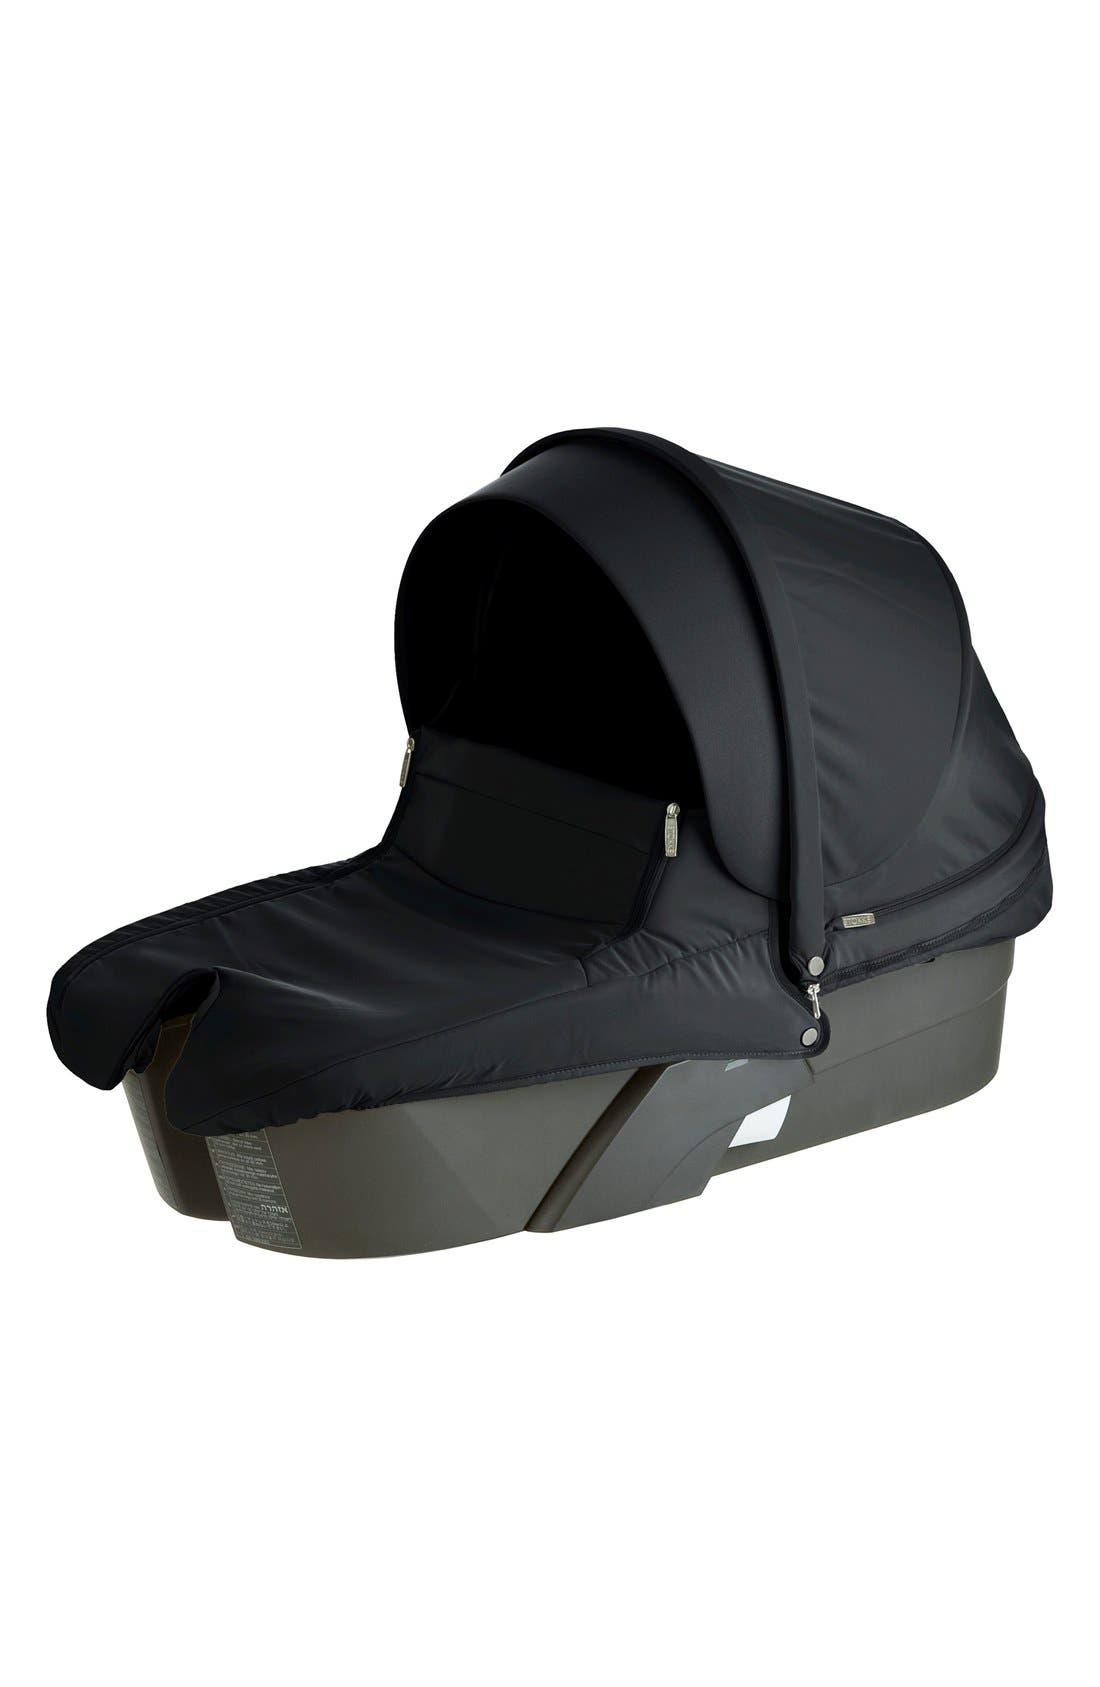 Stokke 'Xplory®' Stroller Carry Cot